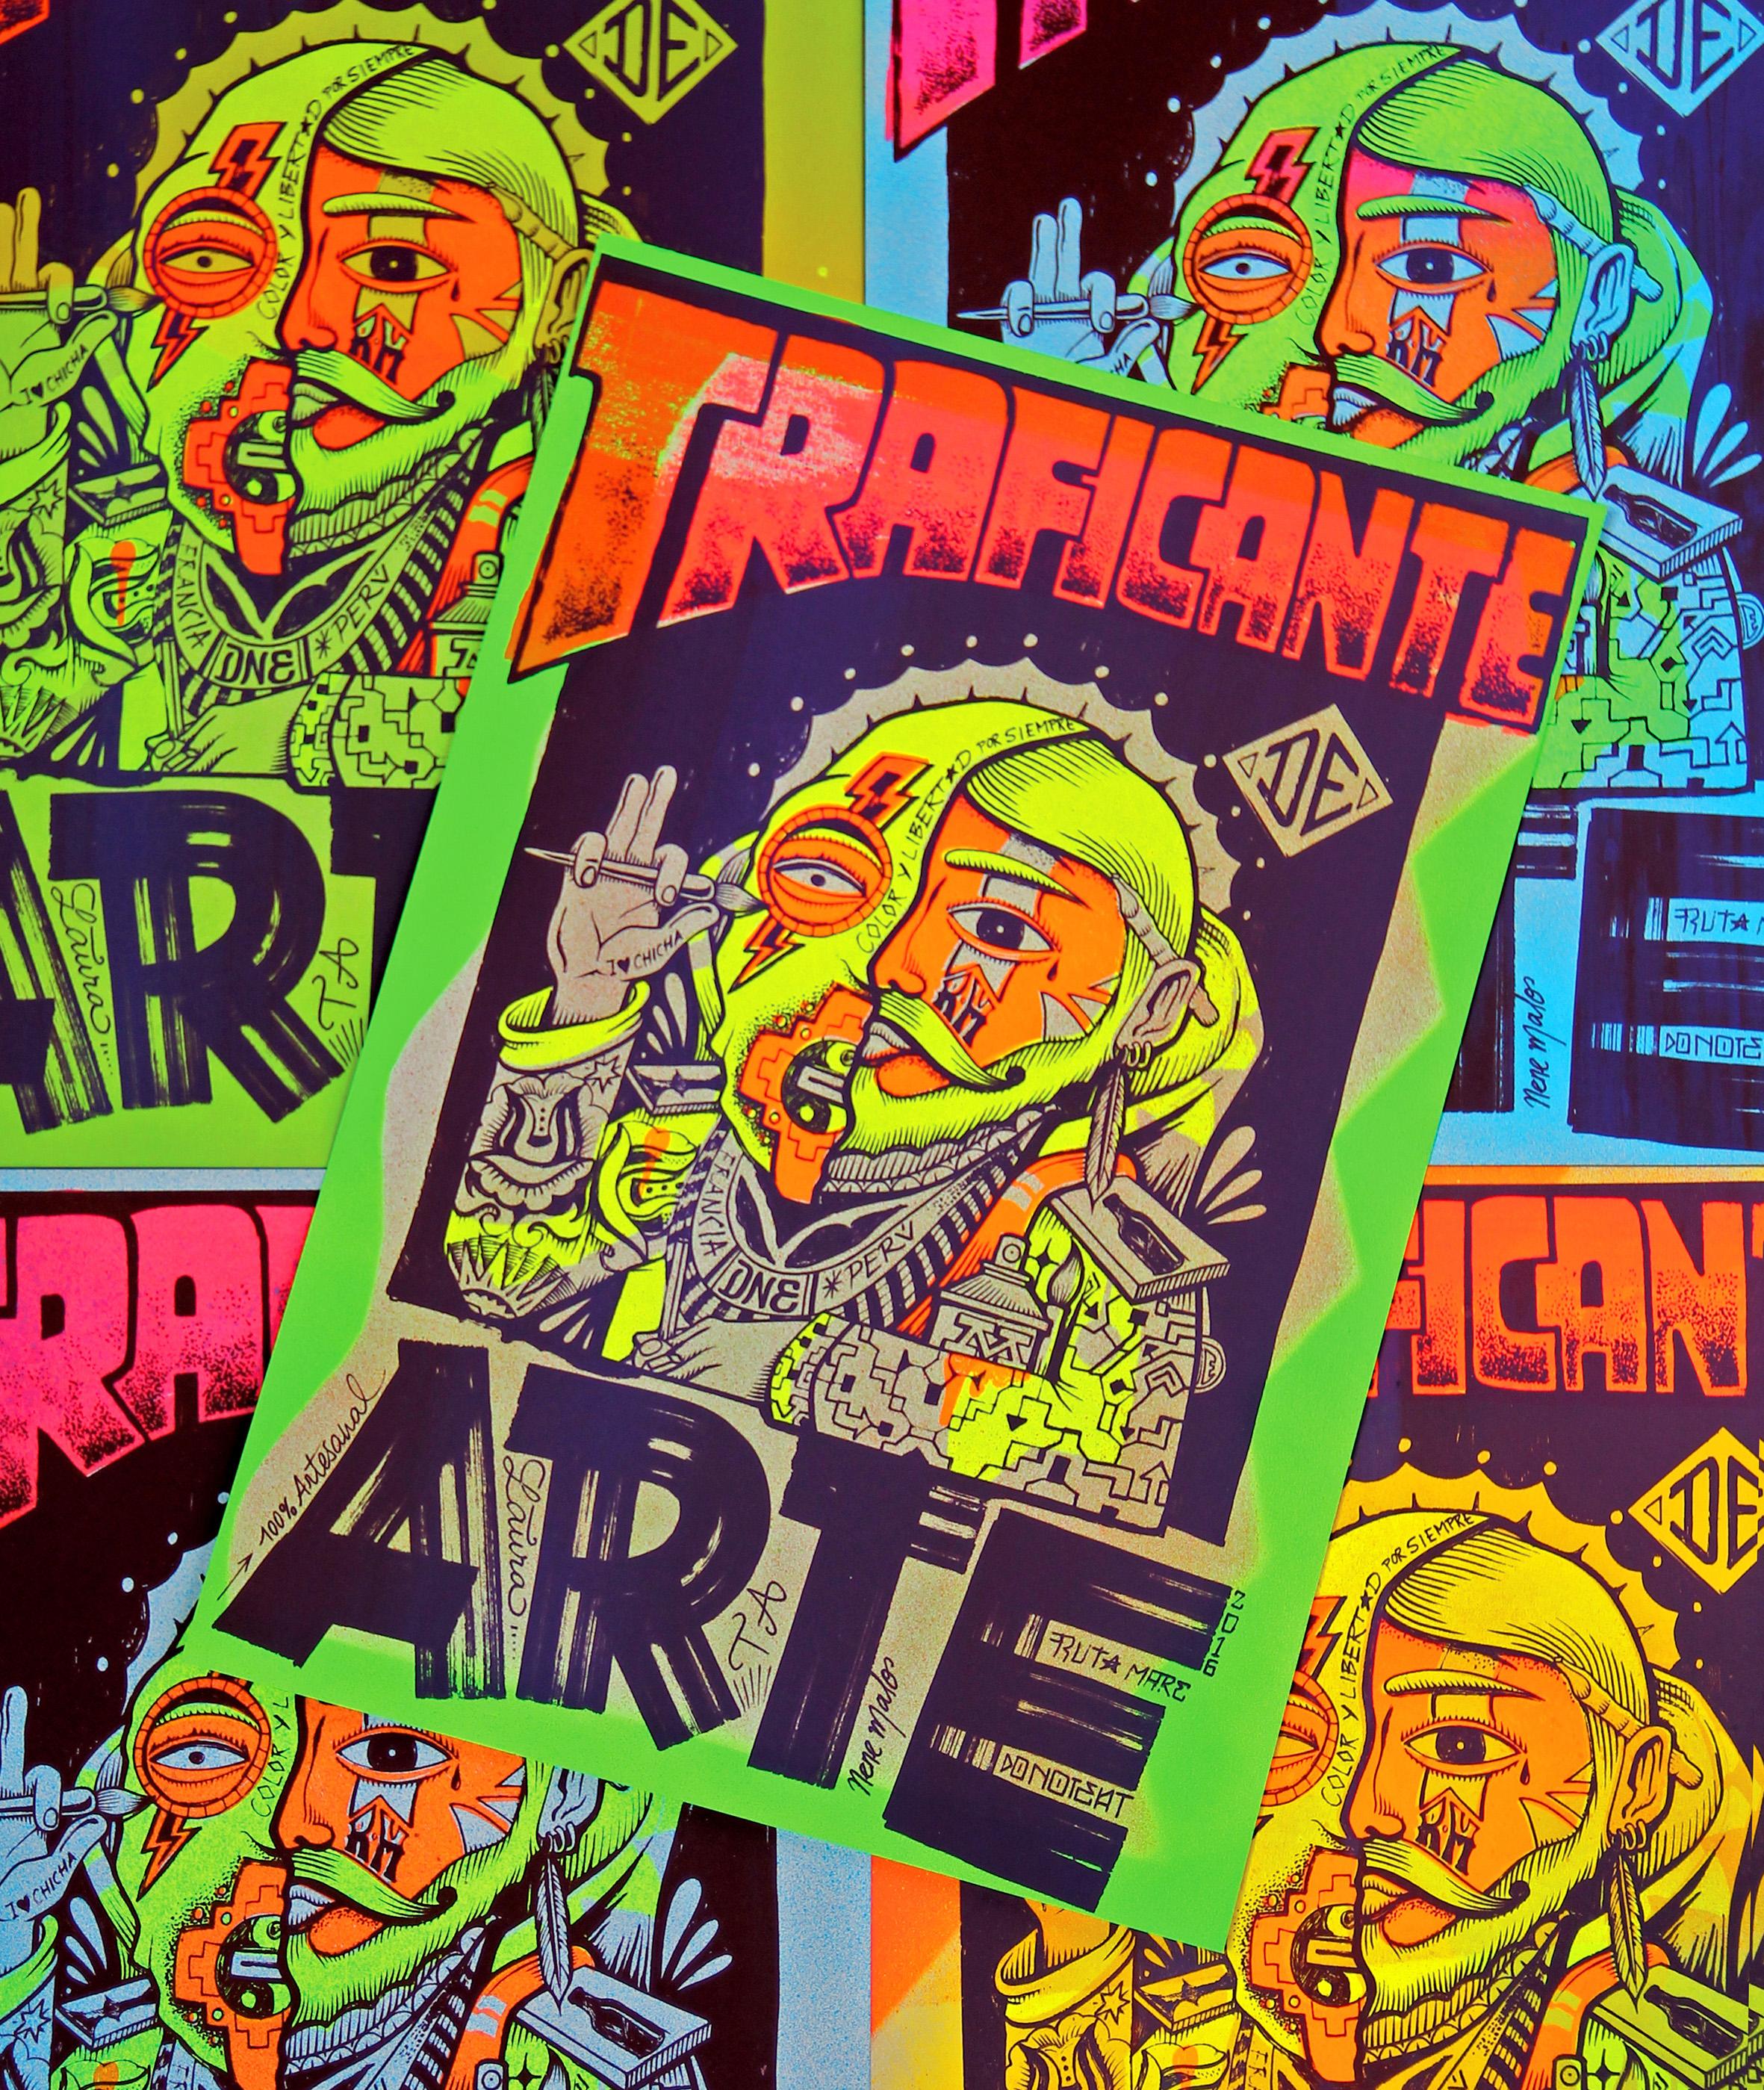 Galerie_d'Art_l'Arcade_Saint-Clar_pic_ex